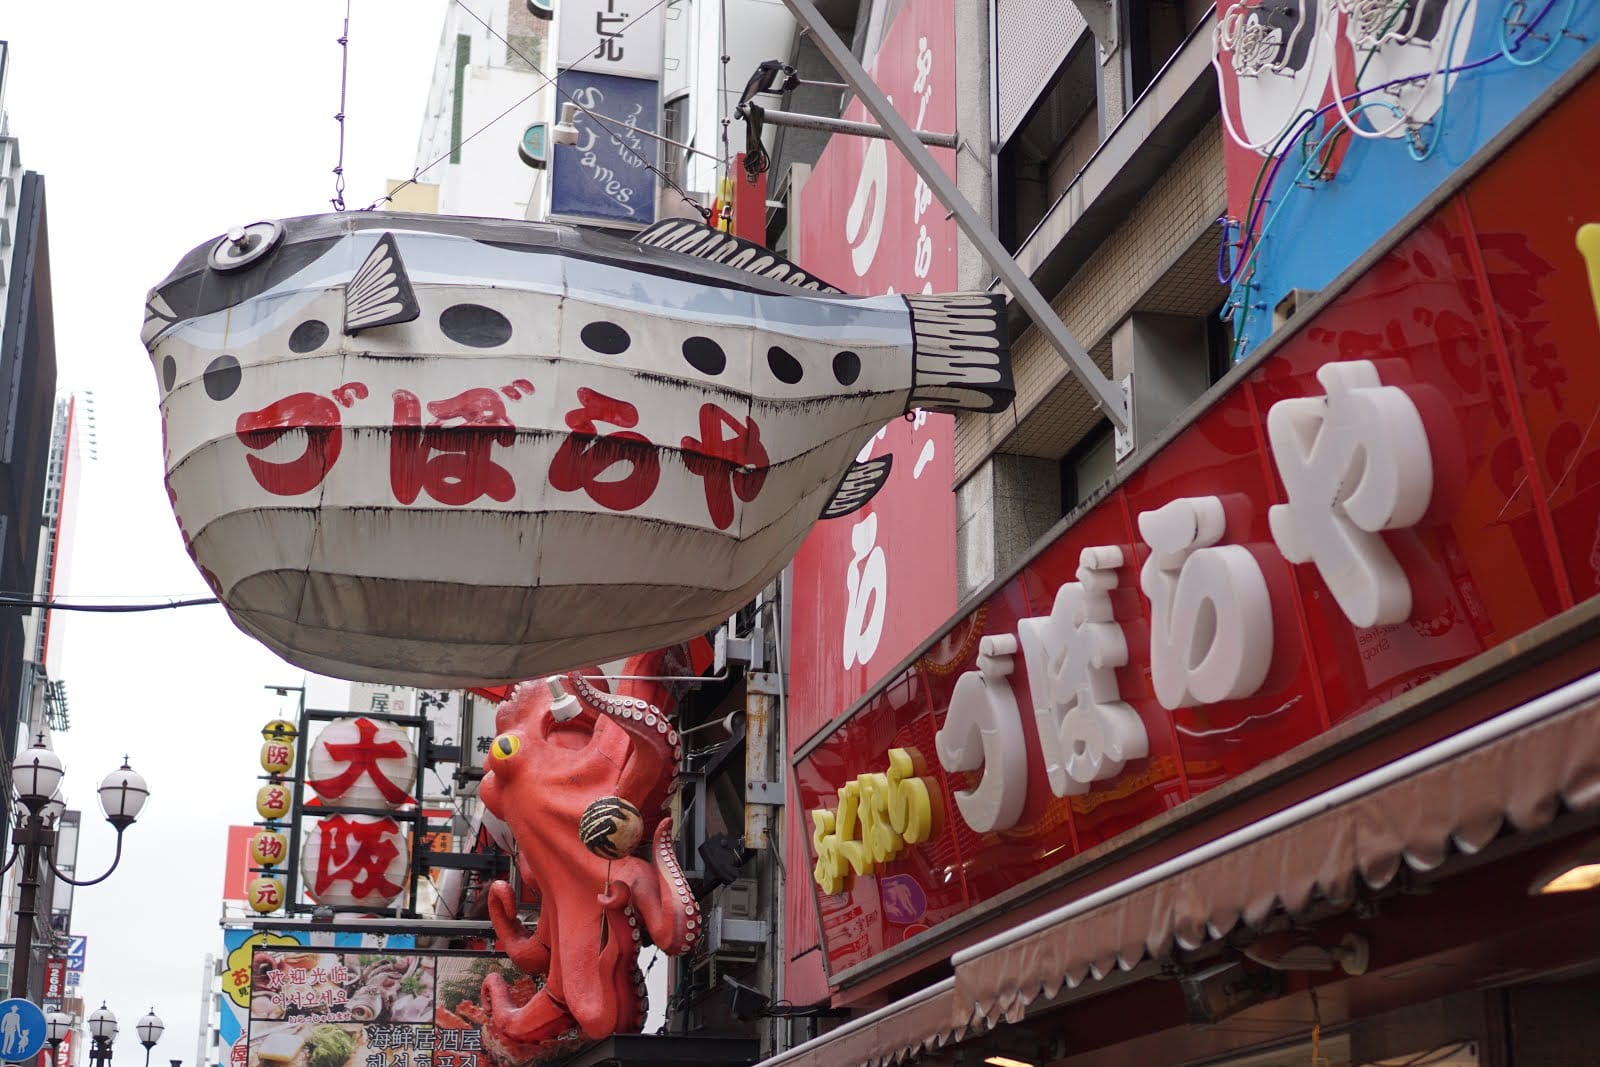 Zuboraya - Osaka Pufferfish Restaurant